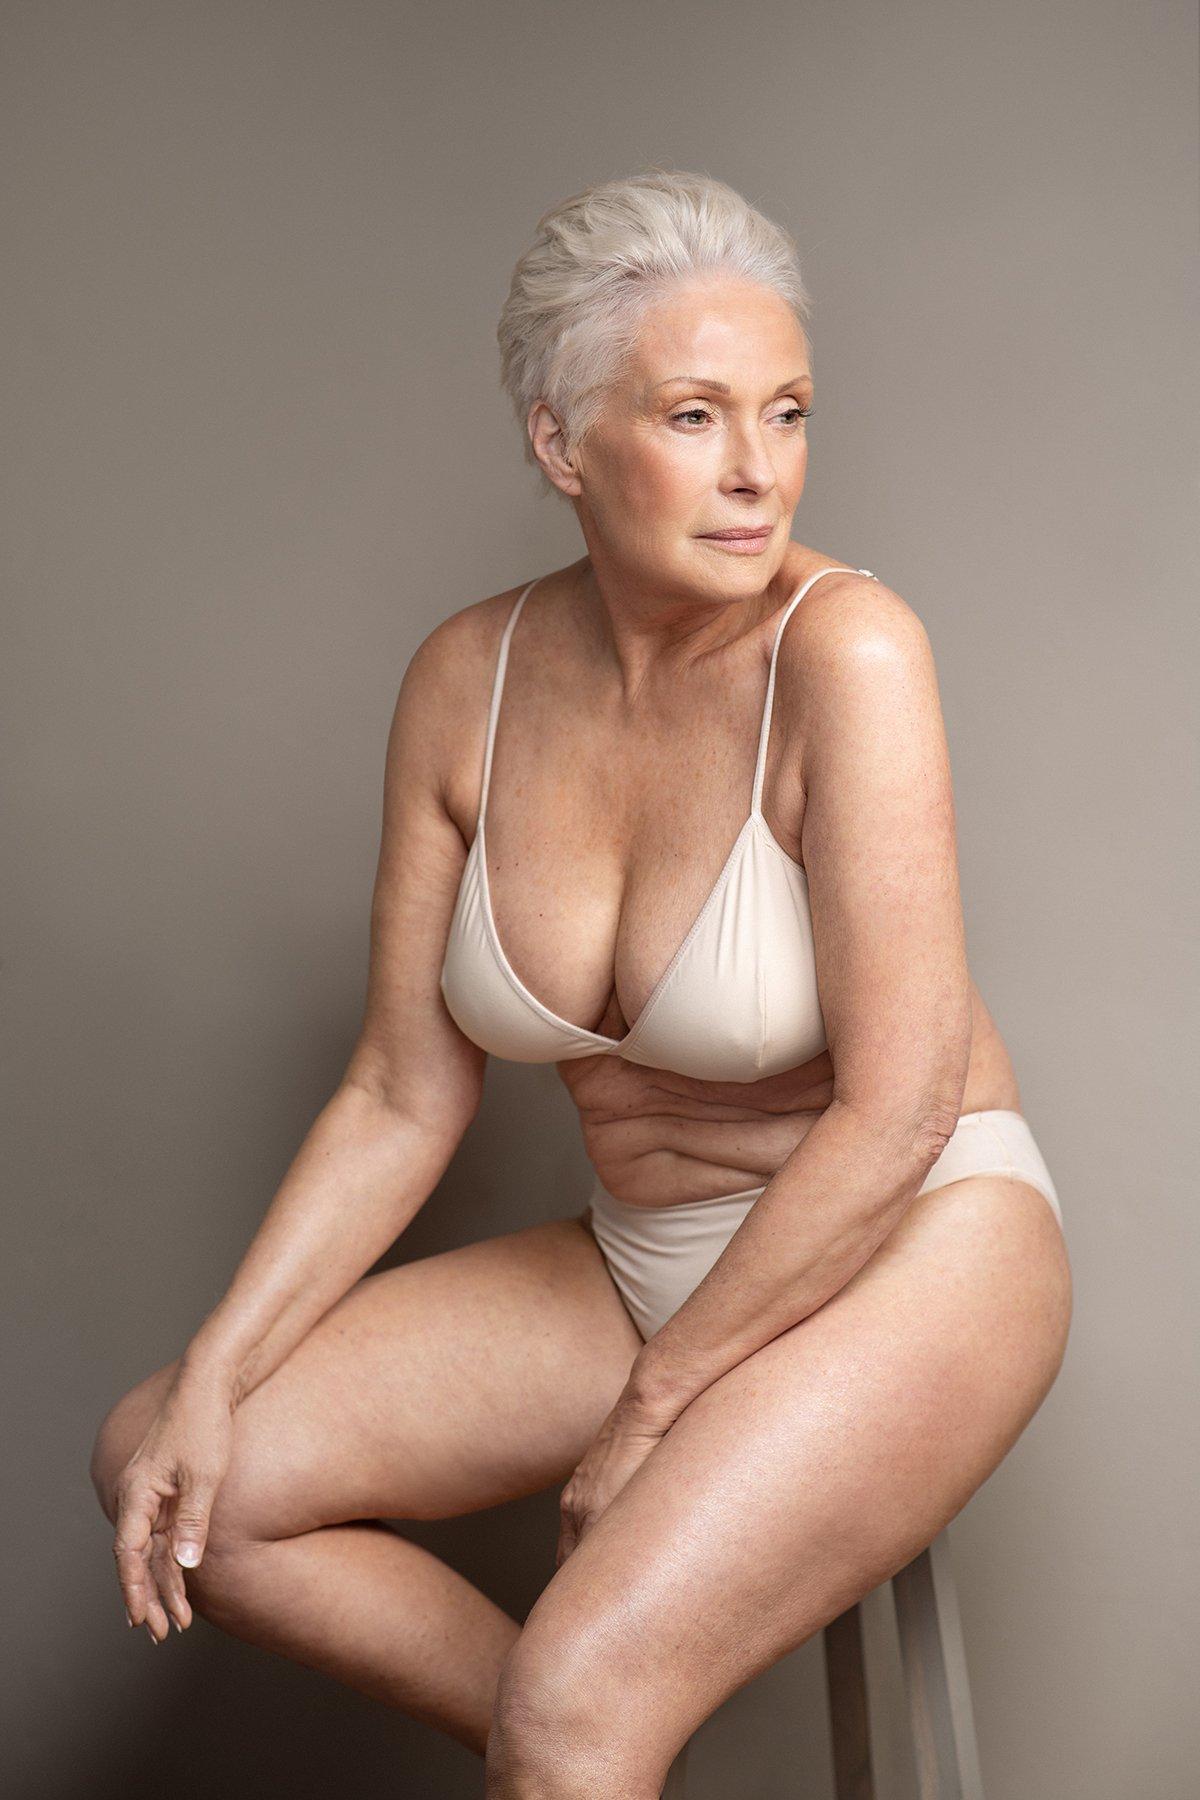 sokoloff lingerie basics top blanc femme âgée